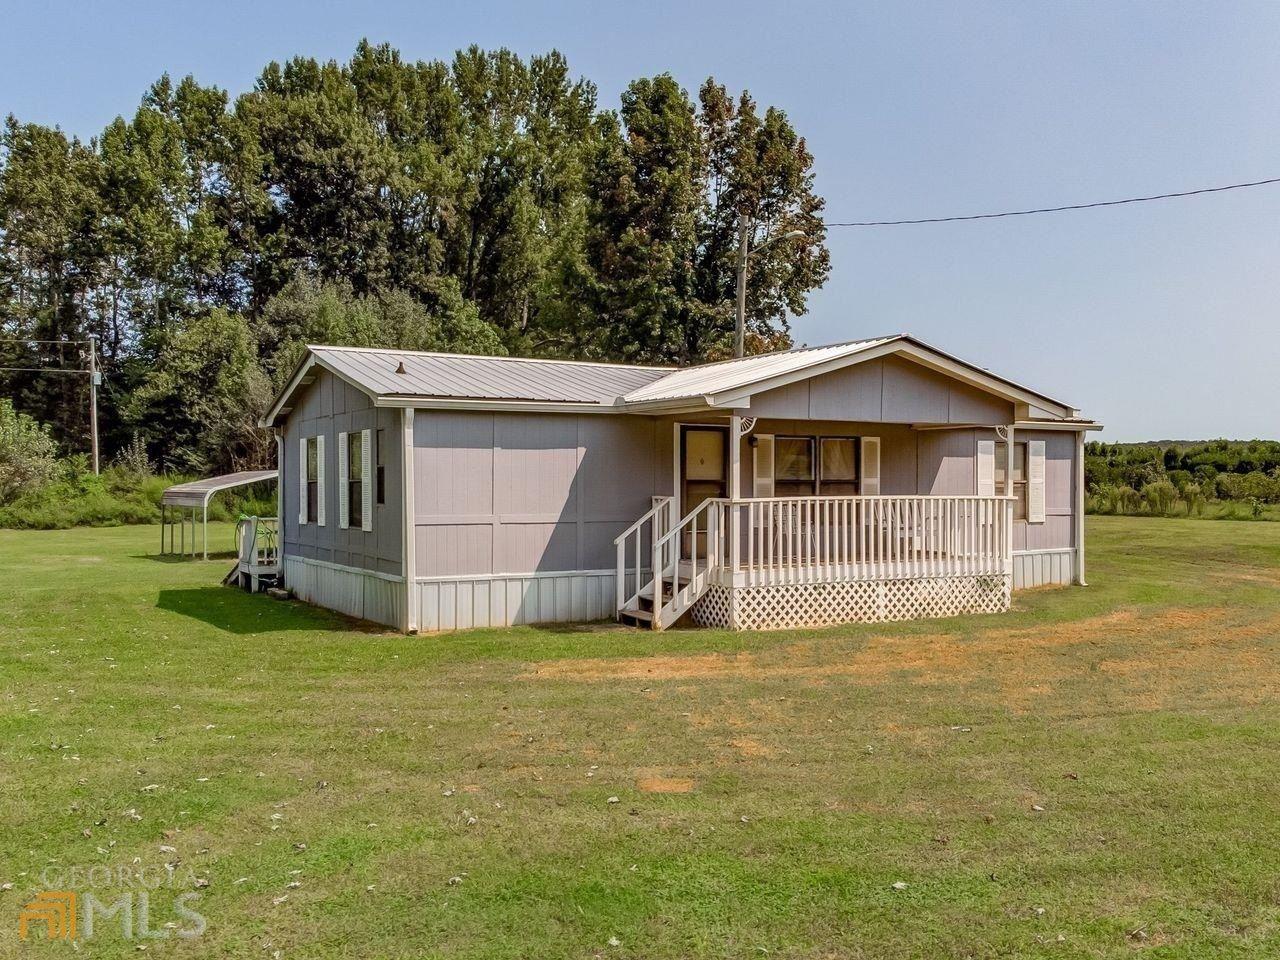 Dawsonville, GA 30534